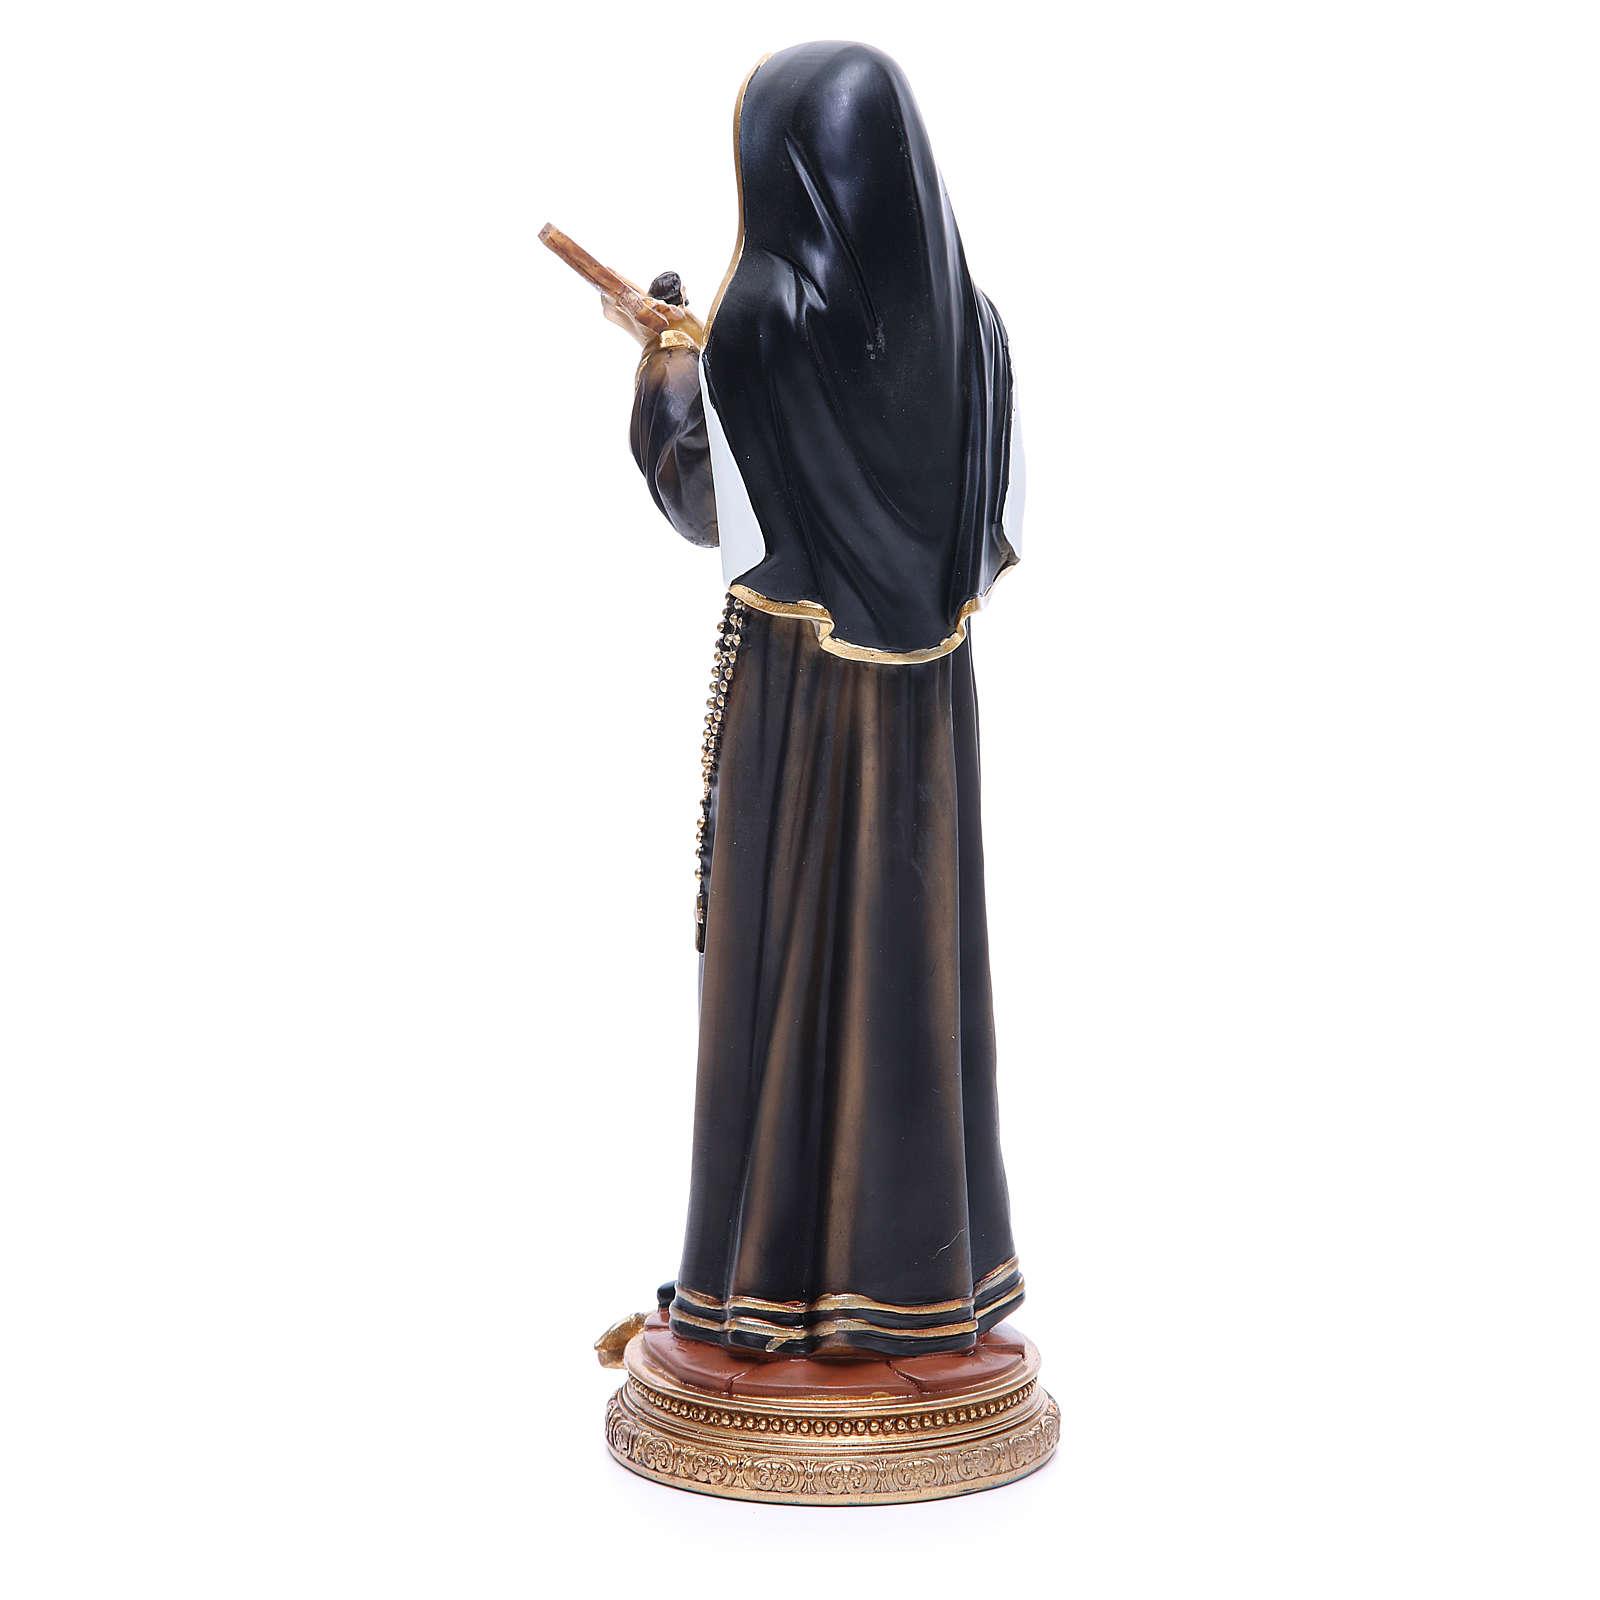 St Rita of Cascia resin statue 12.5 inches 4